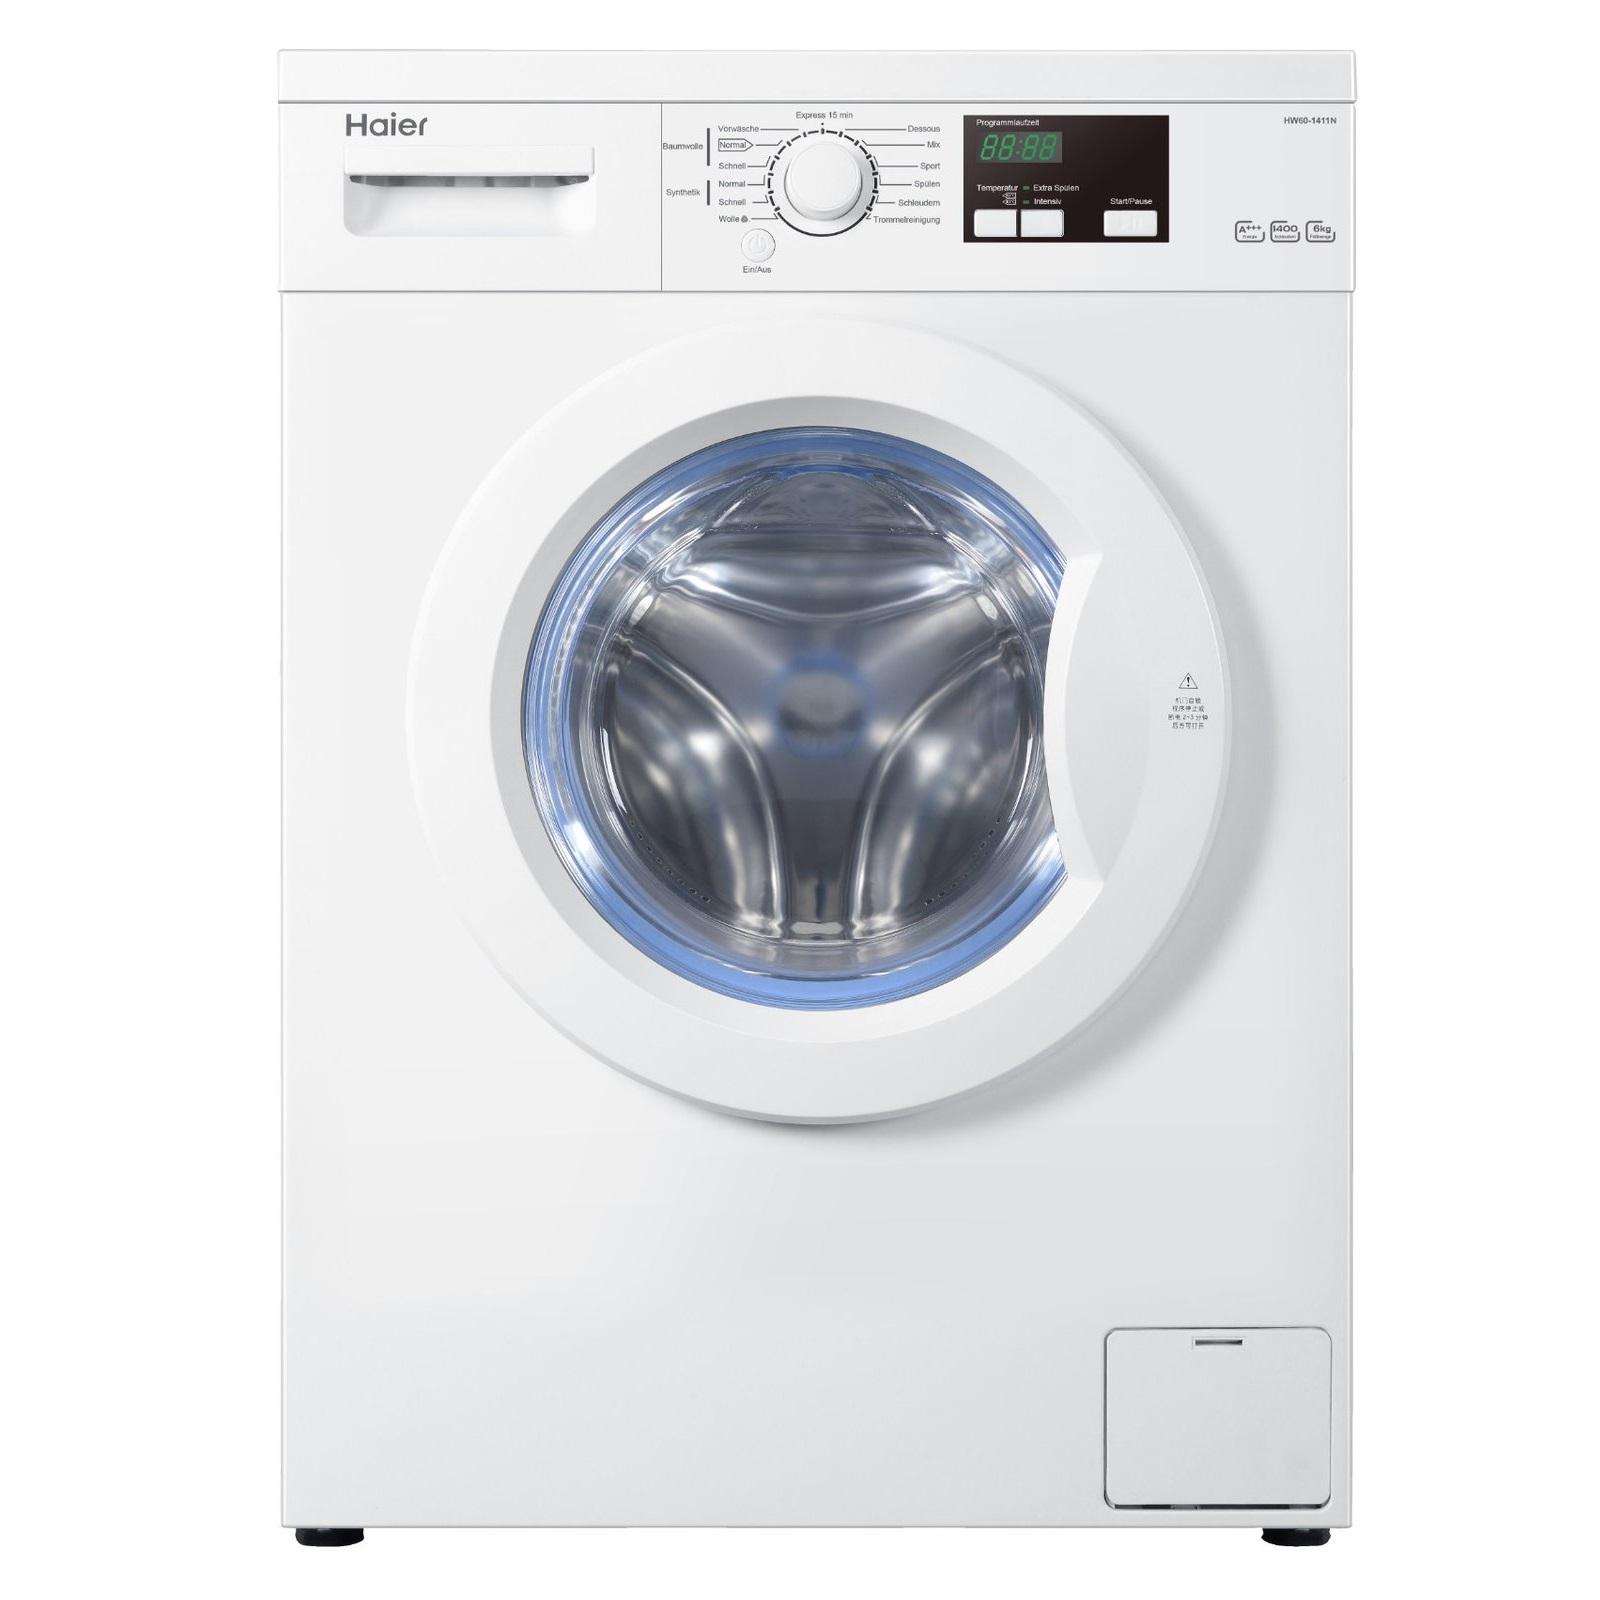 tipp 2x haier hw70 1411n waschmaschine 7 kg 1400 u min a f r 369. Black Bedroom Furniture Sets. Home Design Ideas